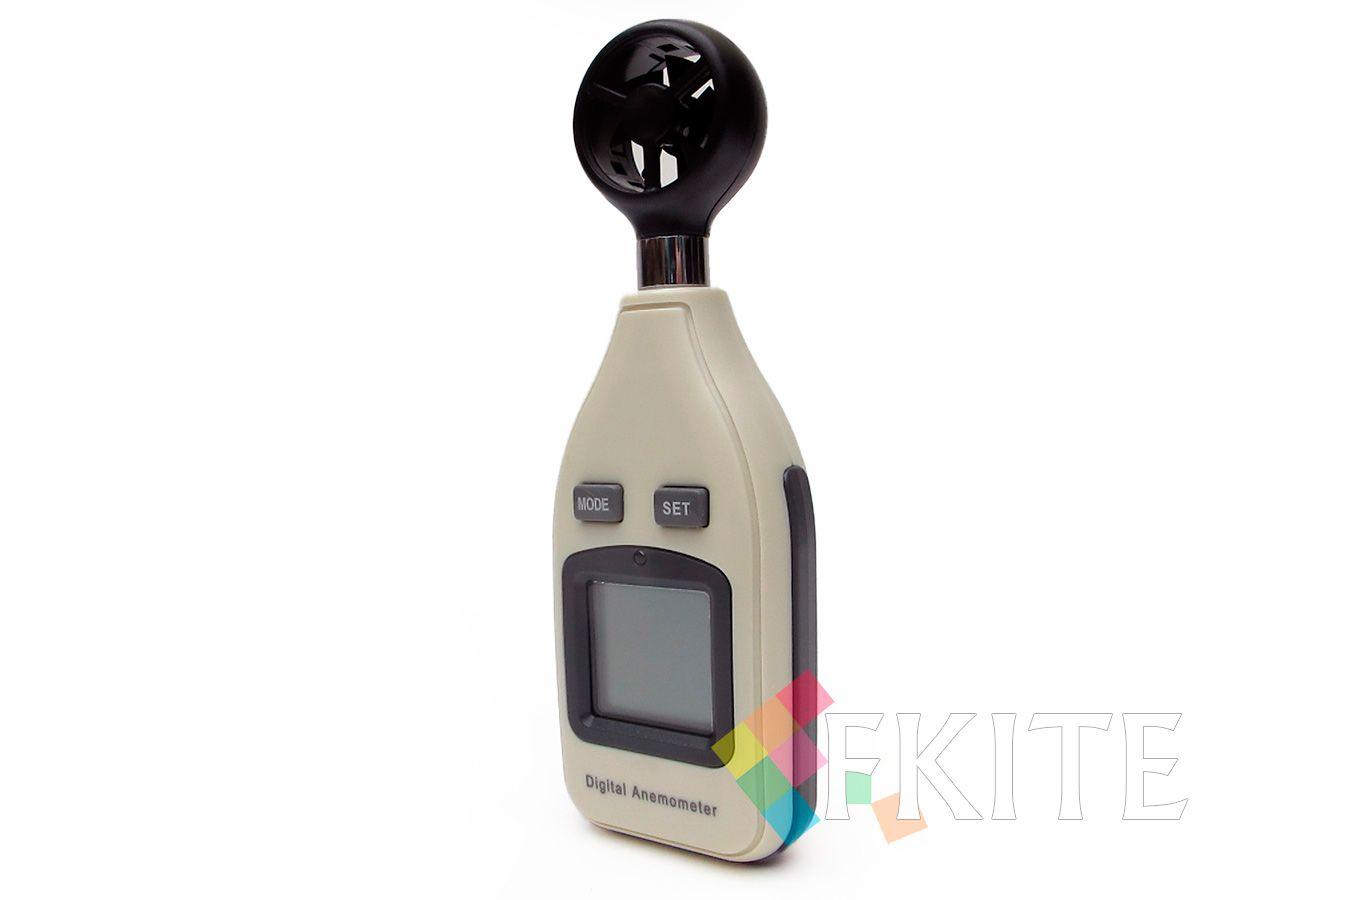 Анемометр цифровой крыльчатый ZC16100 [DA161]